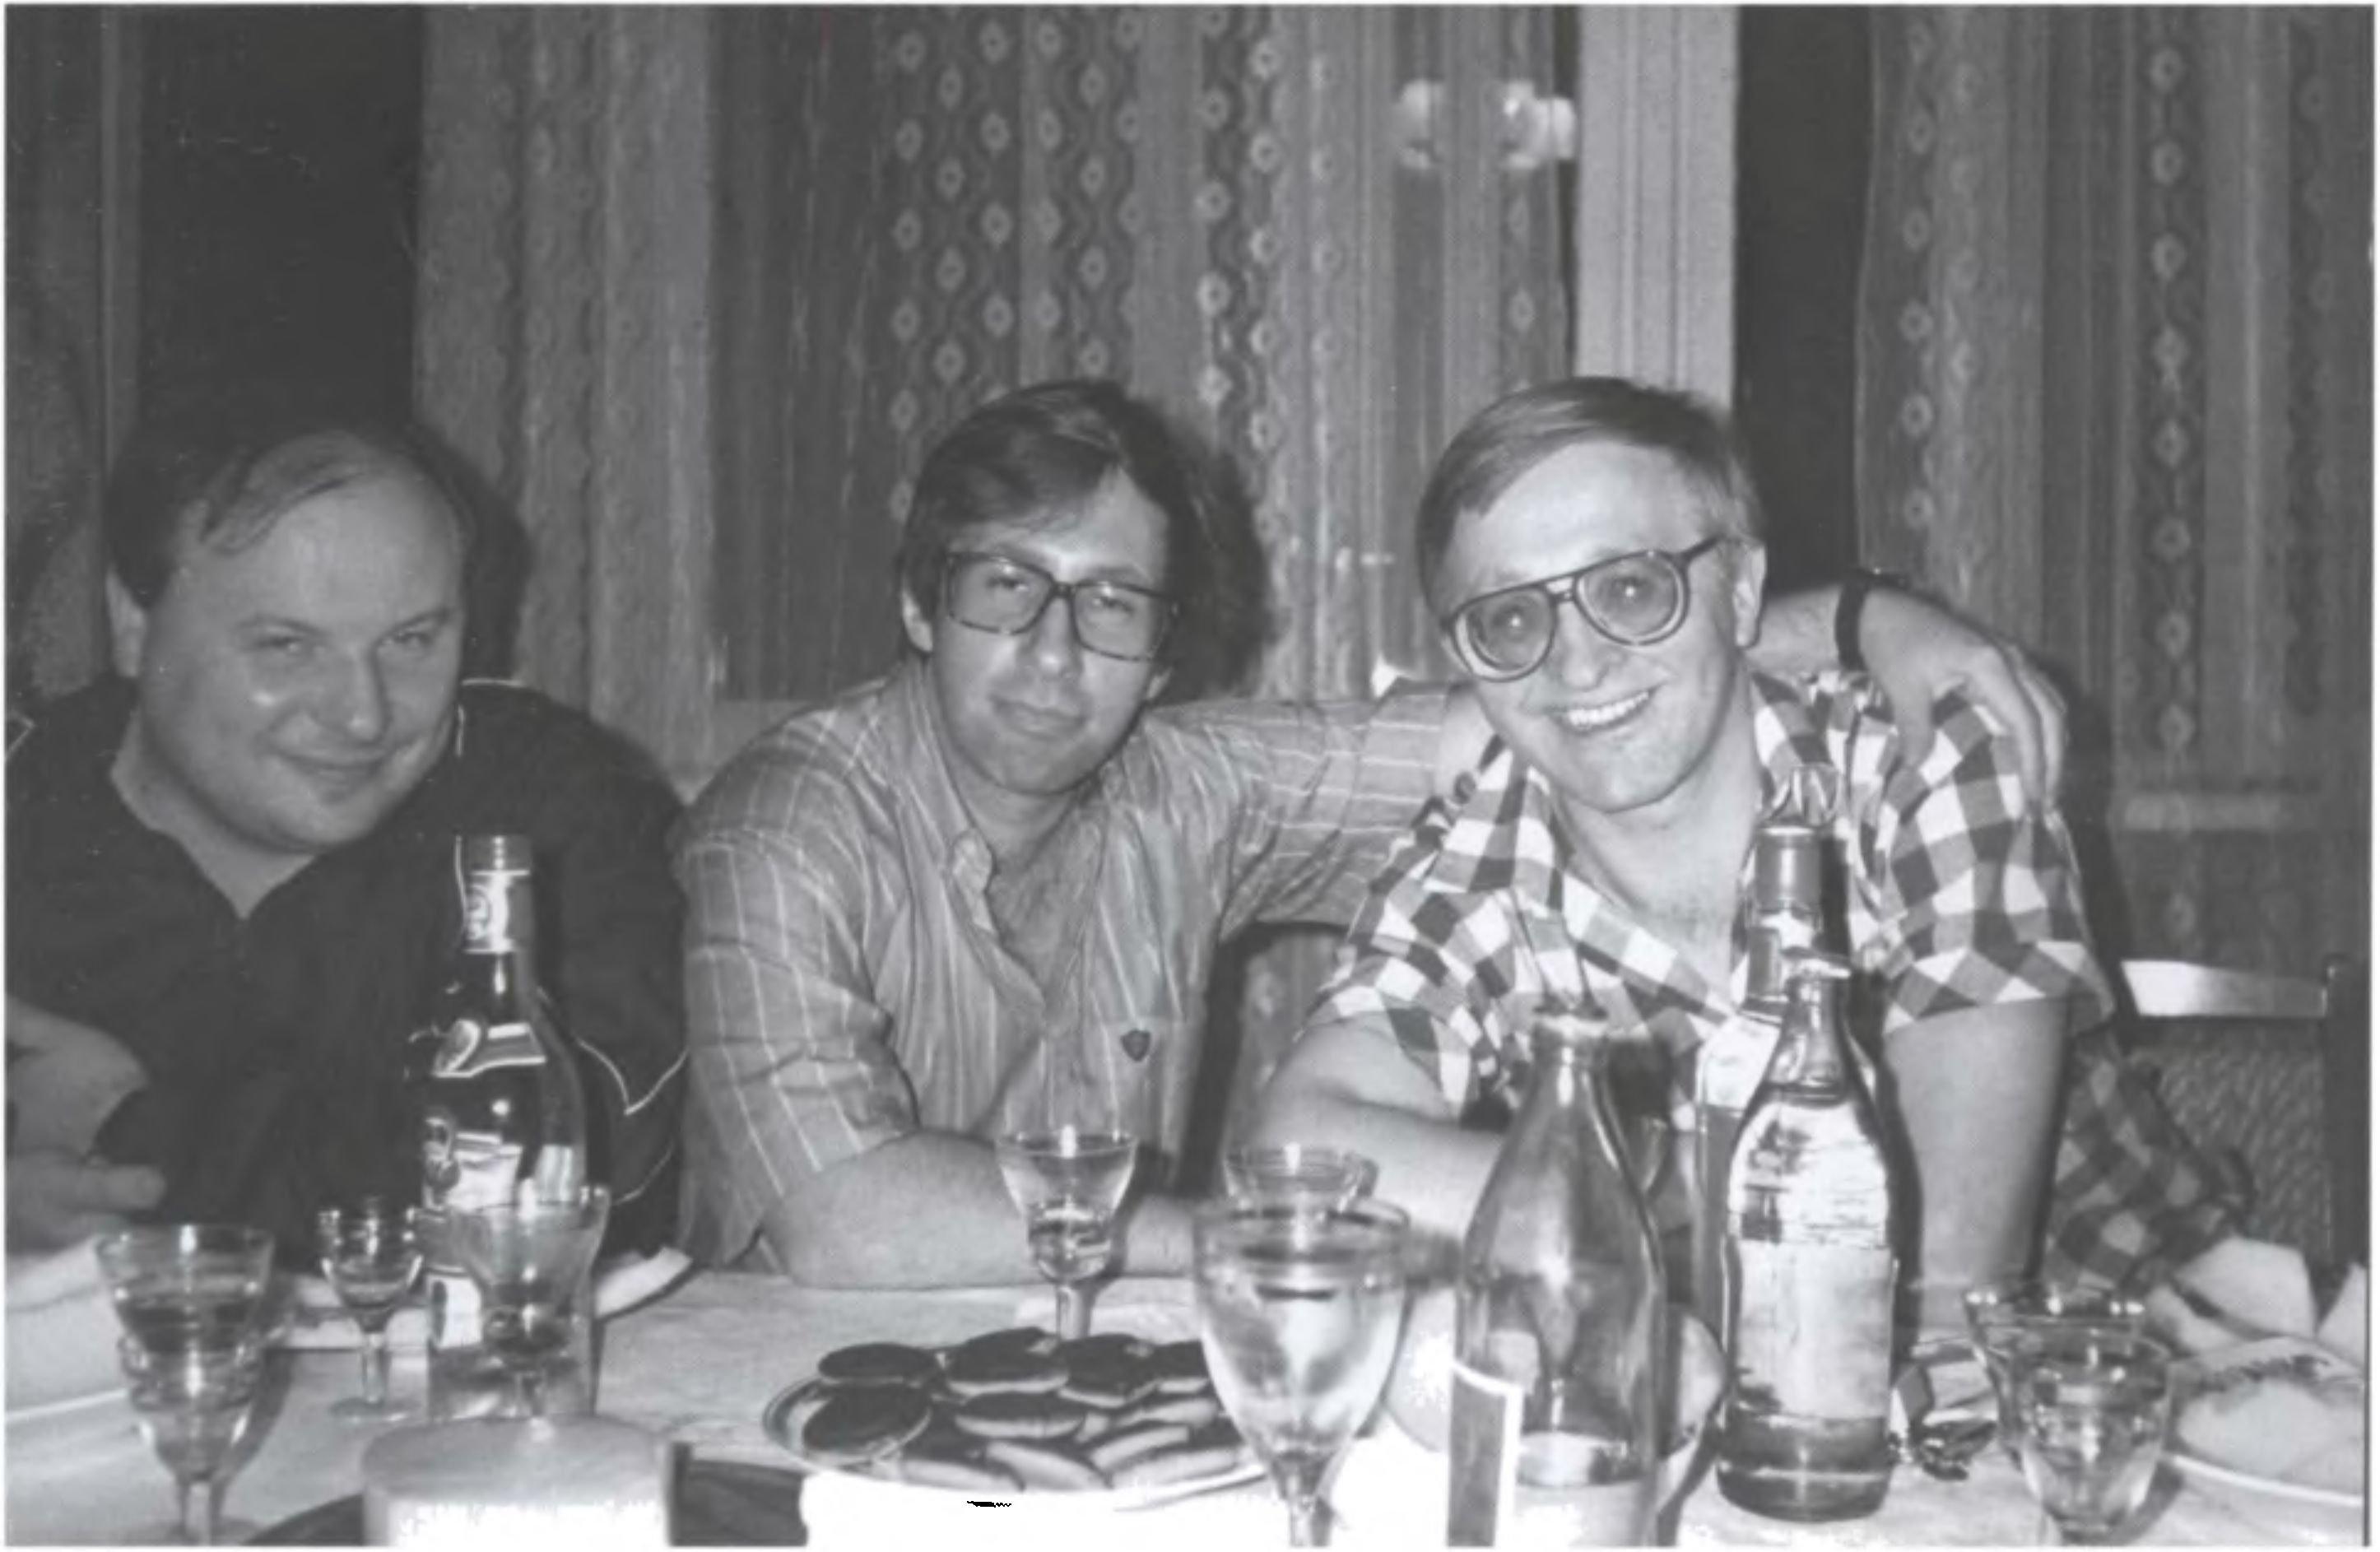 Егор Гайдар, Петр Авен, Александр Шохин на даче в Архангельском, 1992 г